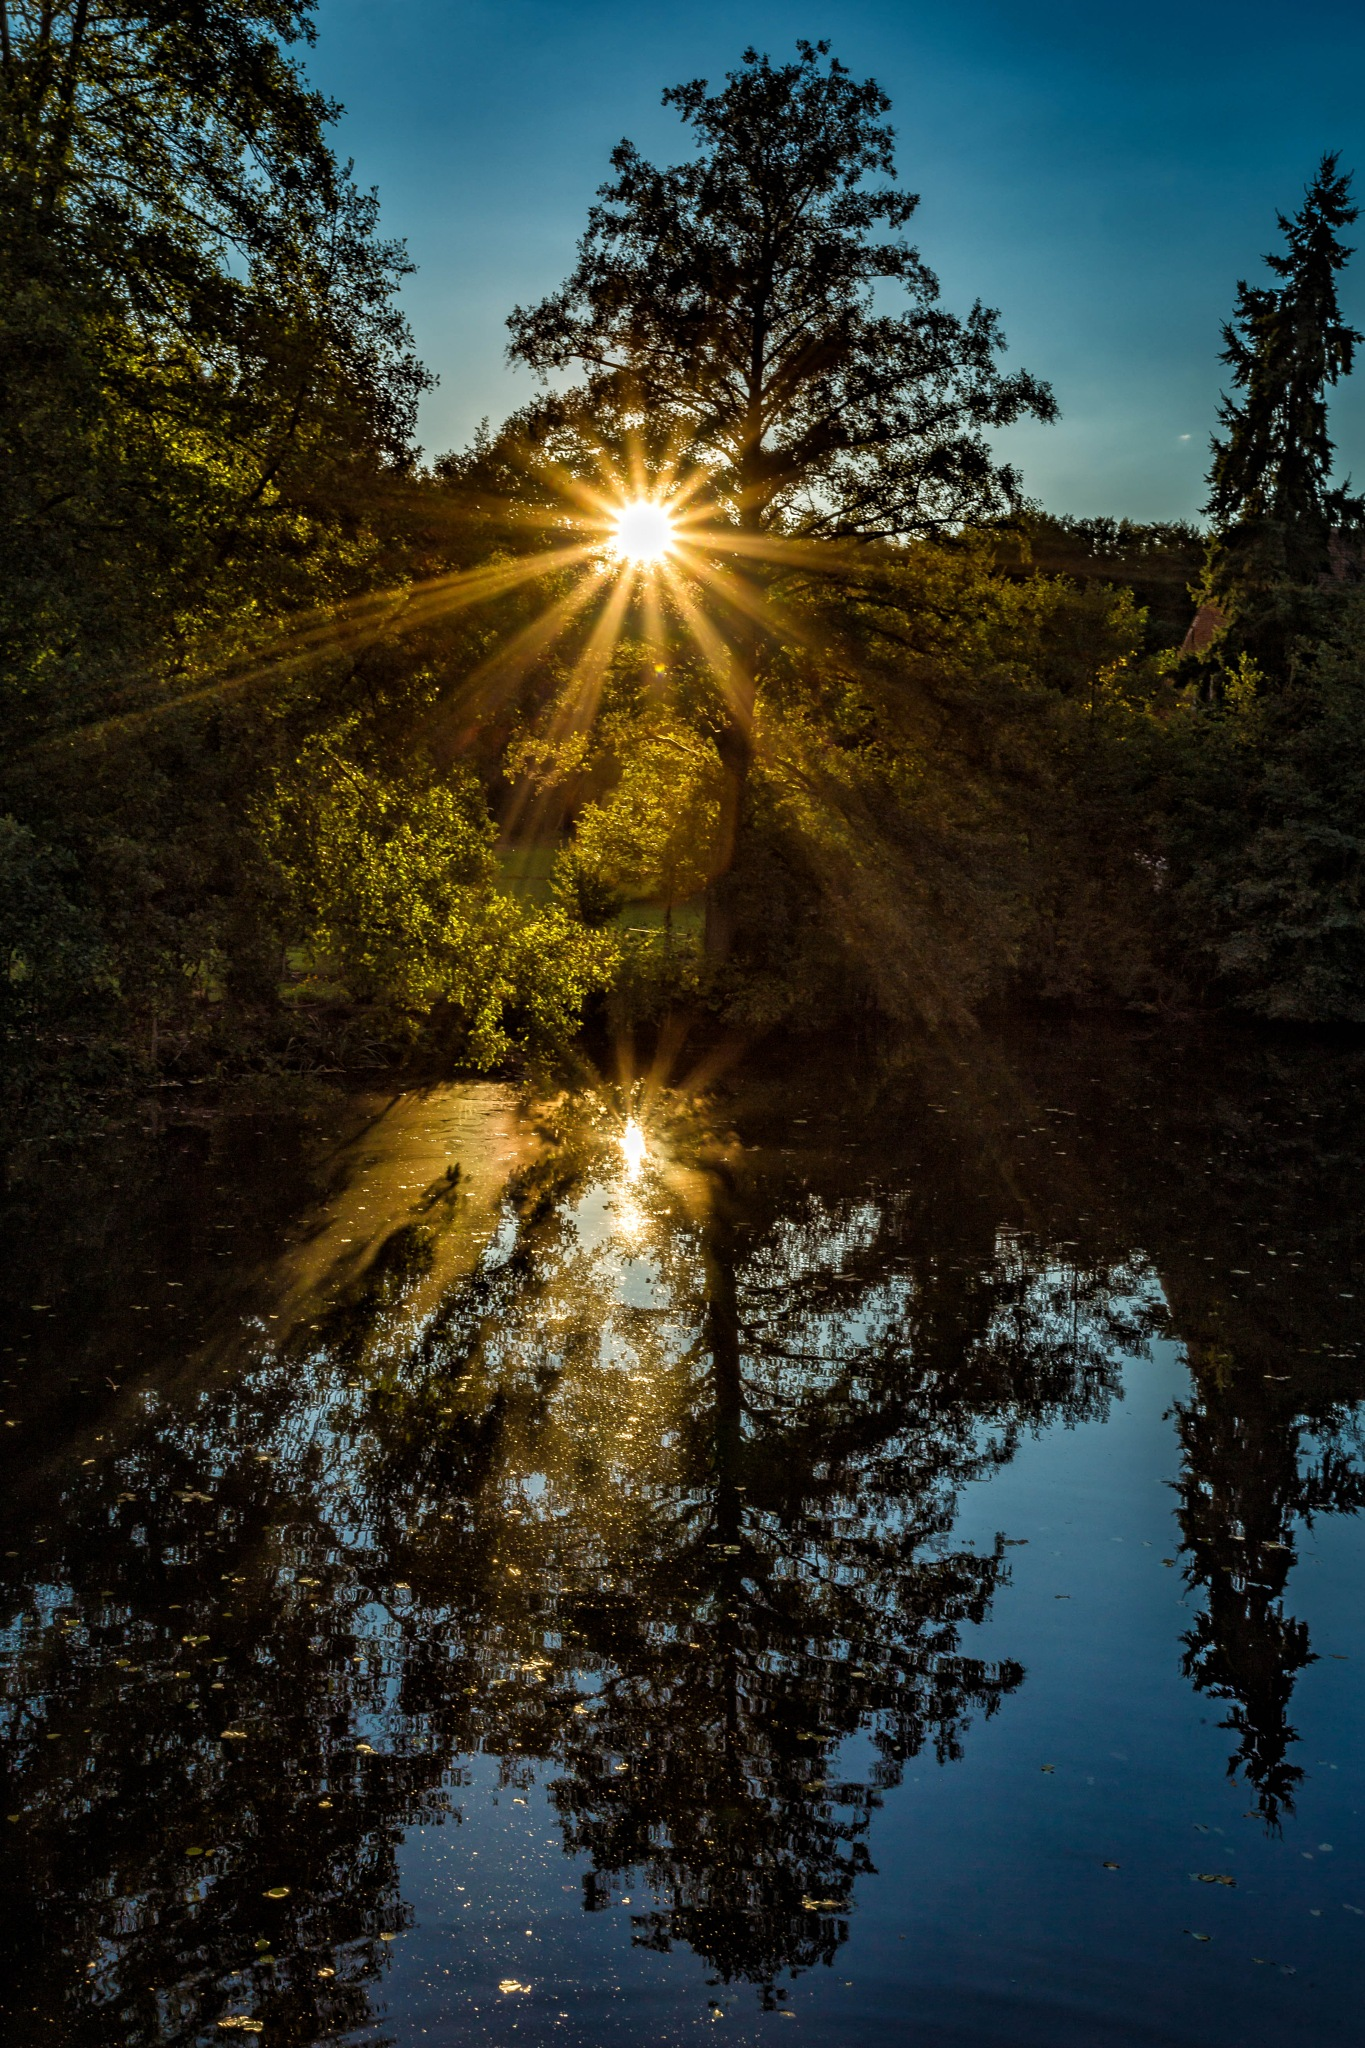 Sunset in Frankonia by Arne Marenda